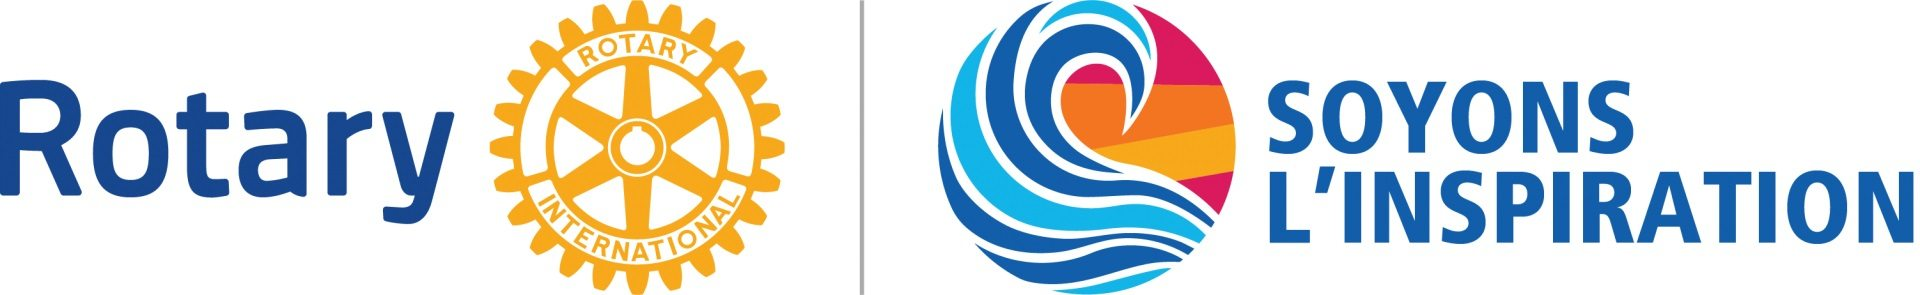 "Rotary International, thème 2018-2019, ""Soyons l'isntpiration"", ""To be inspiration"""